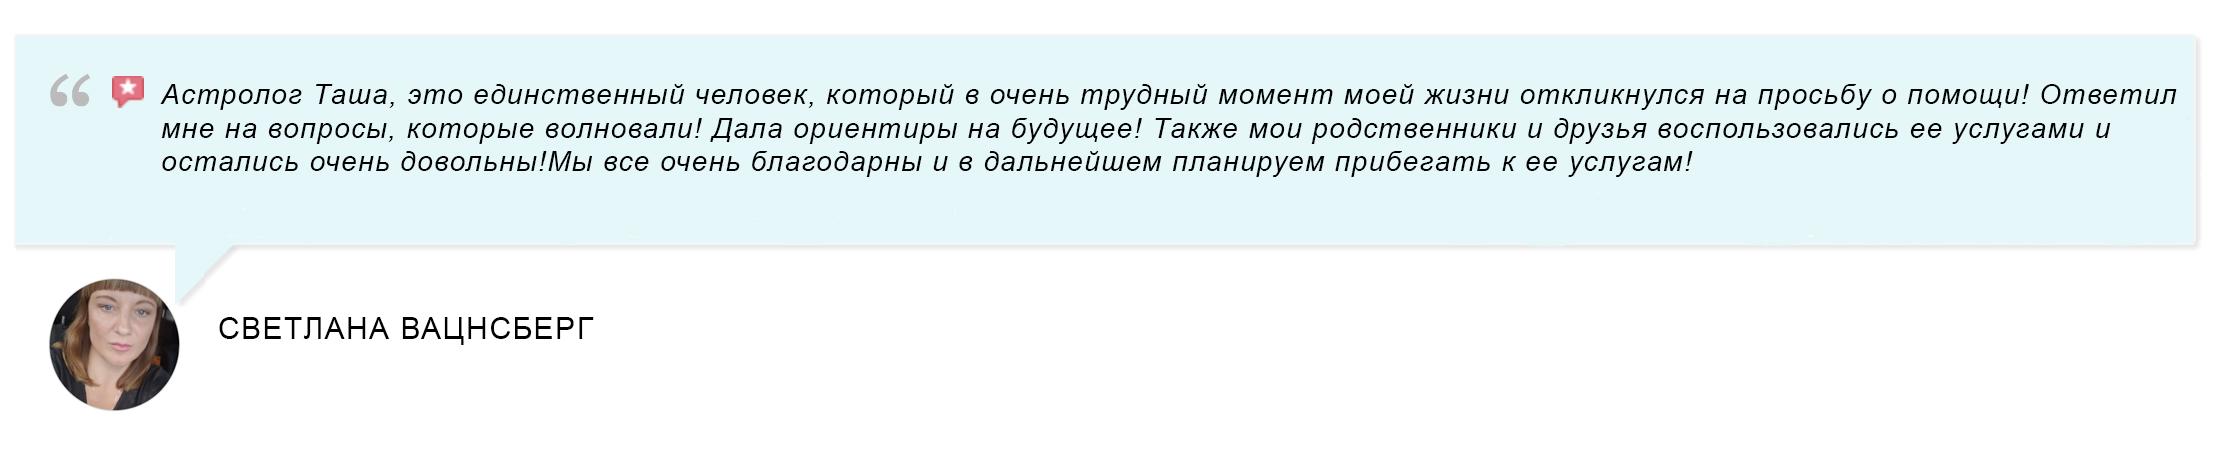 https://astrologtasha.ru/wp-content/uploads/2020/10/svetlana_vacnsberg_otzyv.jpg